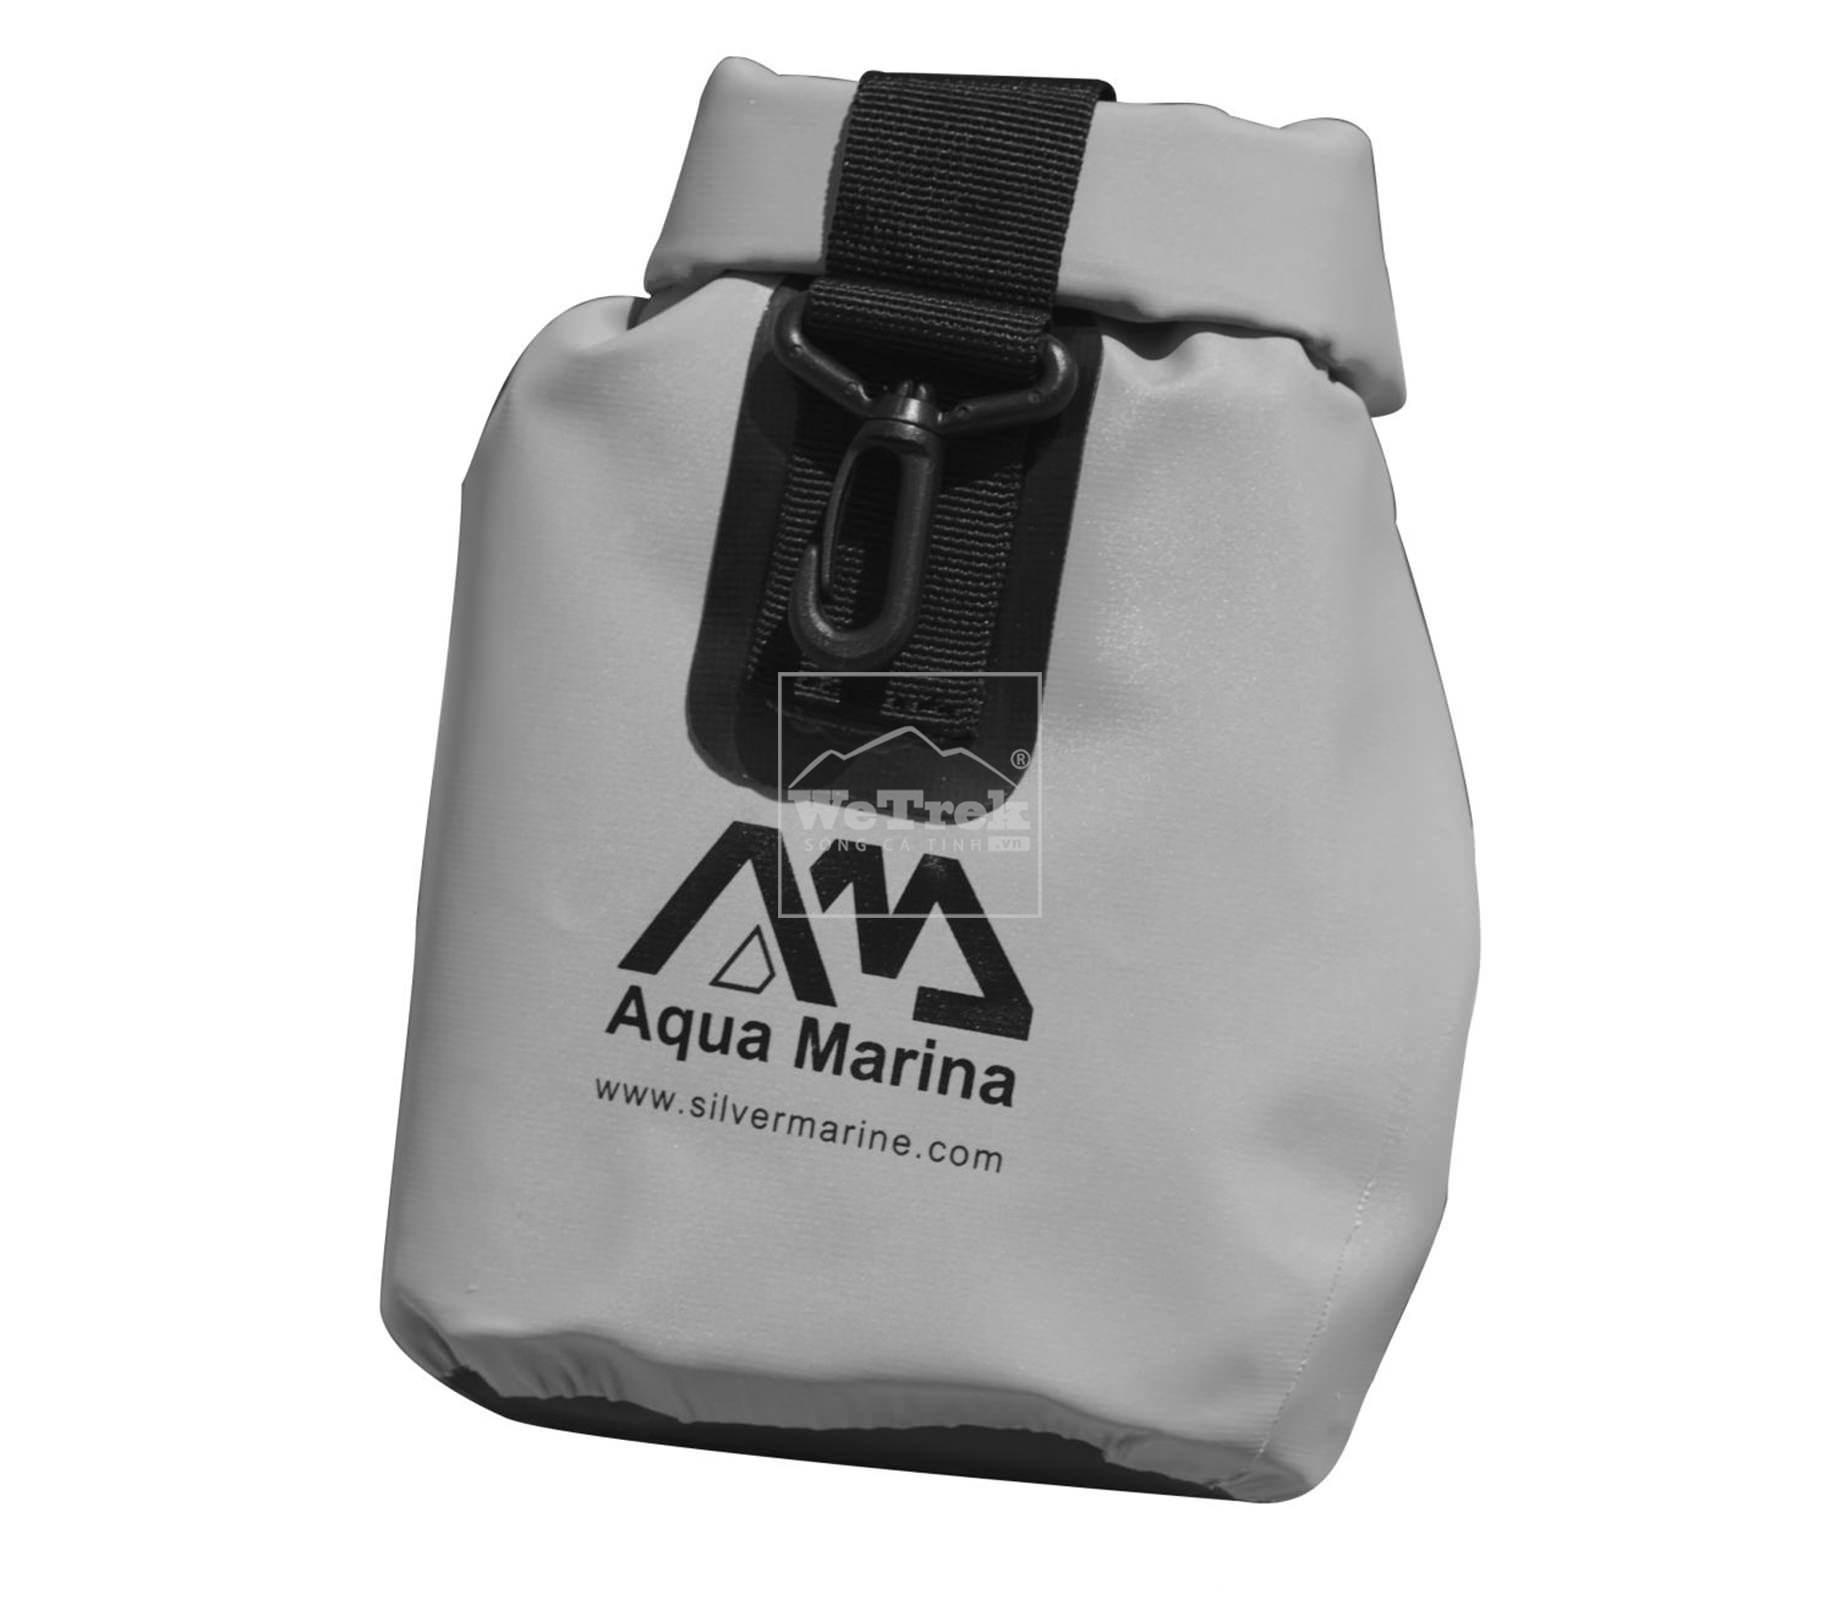 tui-kho-mini-aqua-marina-dry-bag-wetrek.vn-3